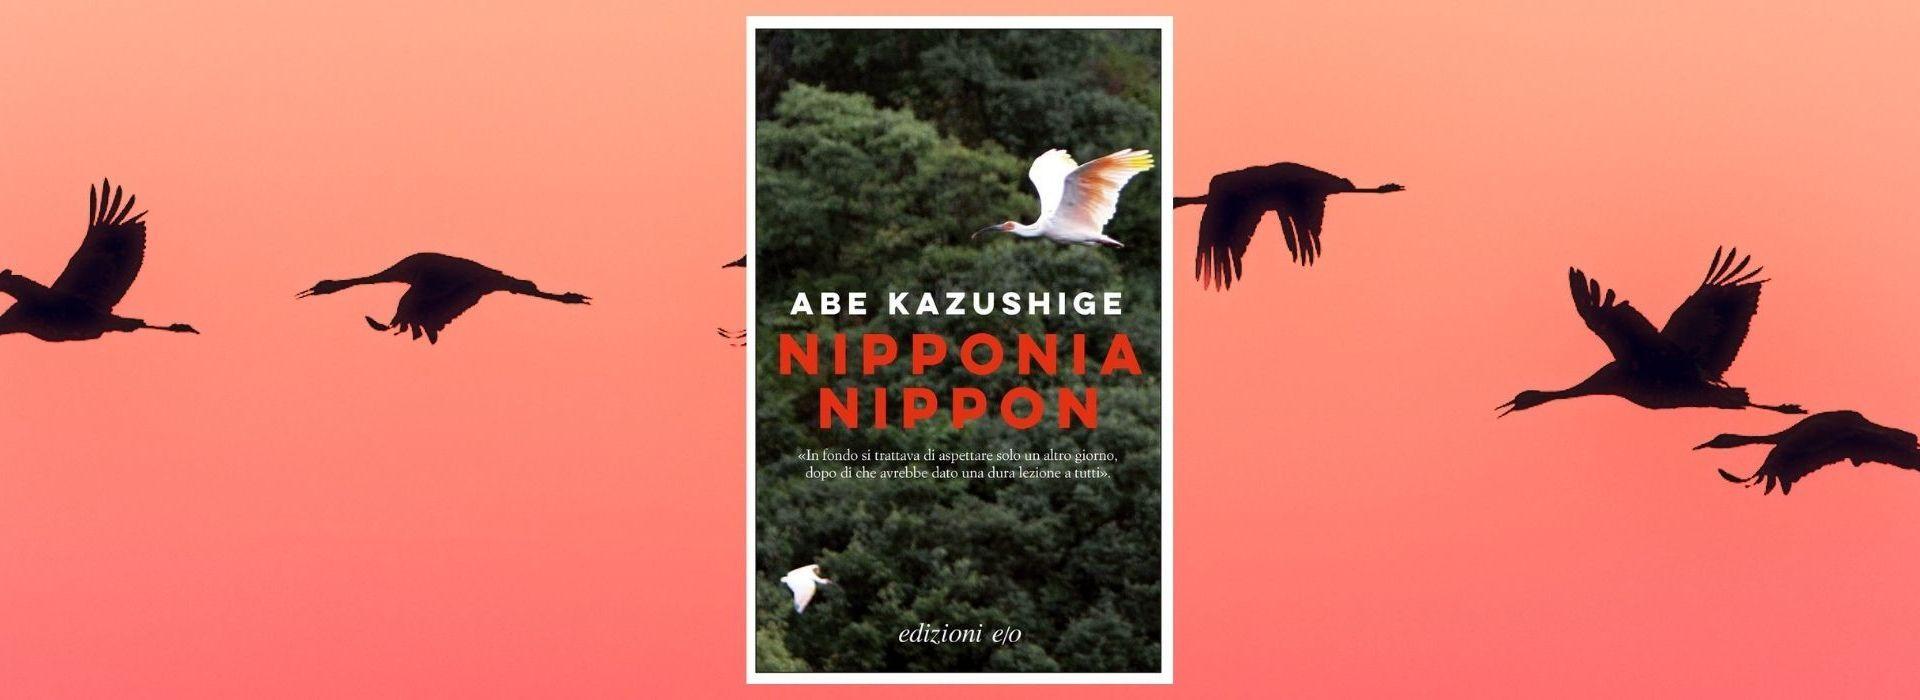 nipponia-nippon-Abe-Kazushige